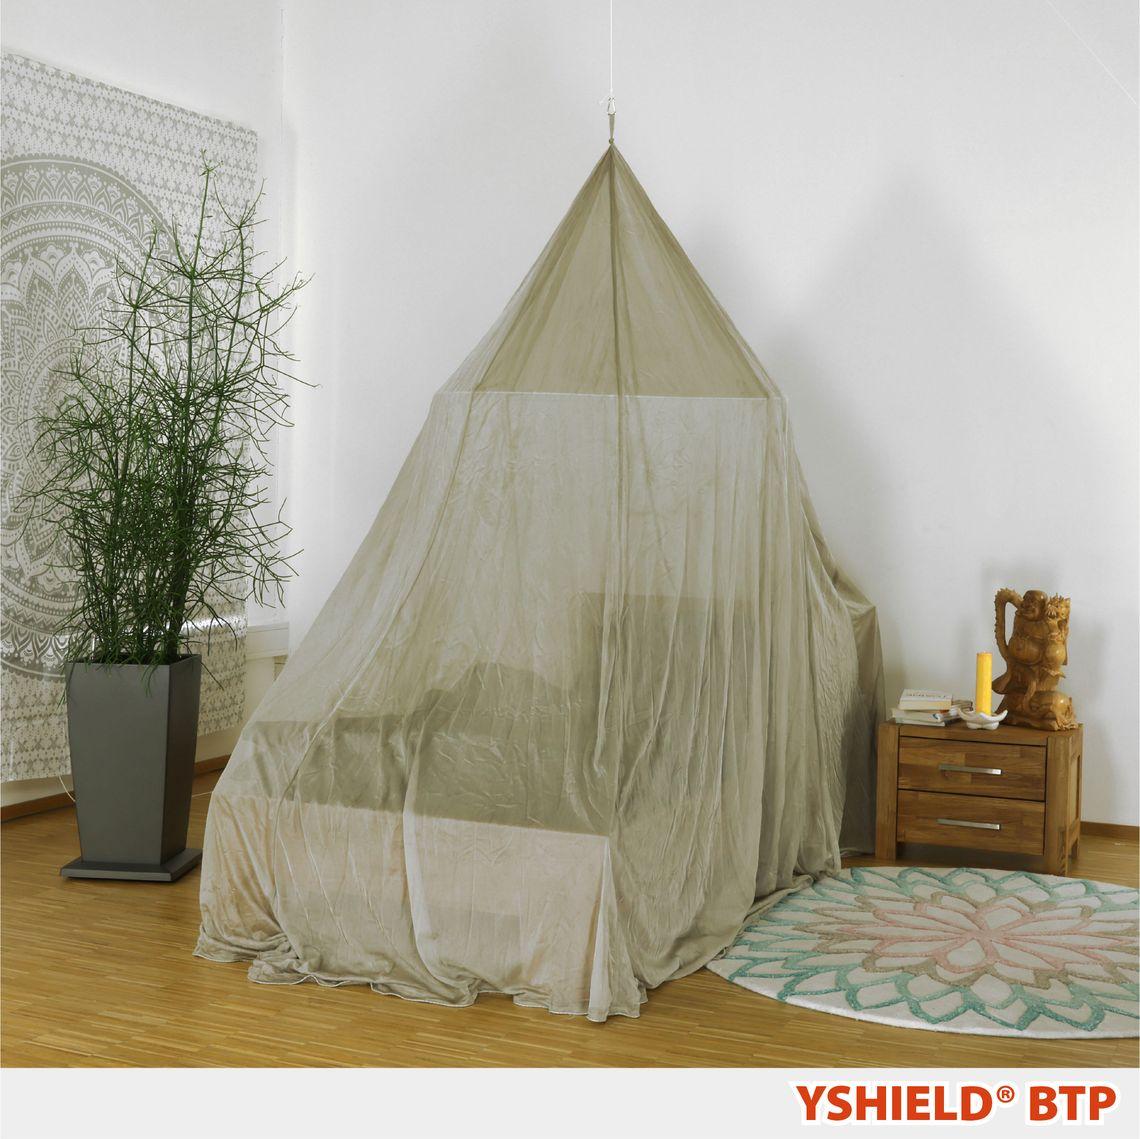 YSHIELD® BTP-M | Abschirmbaldachin | Pyramide | SILVER-TULLE | Miete 14 Tage